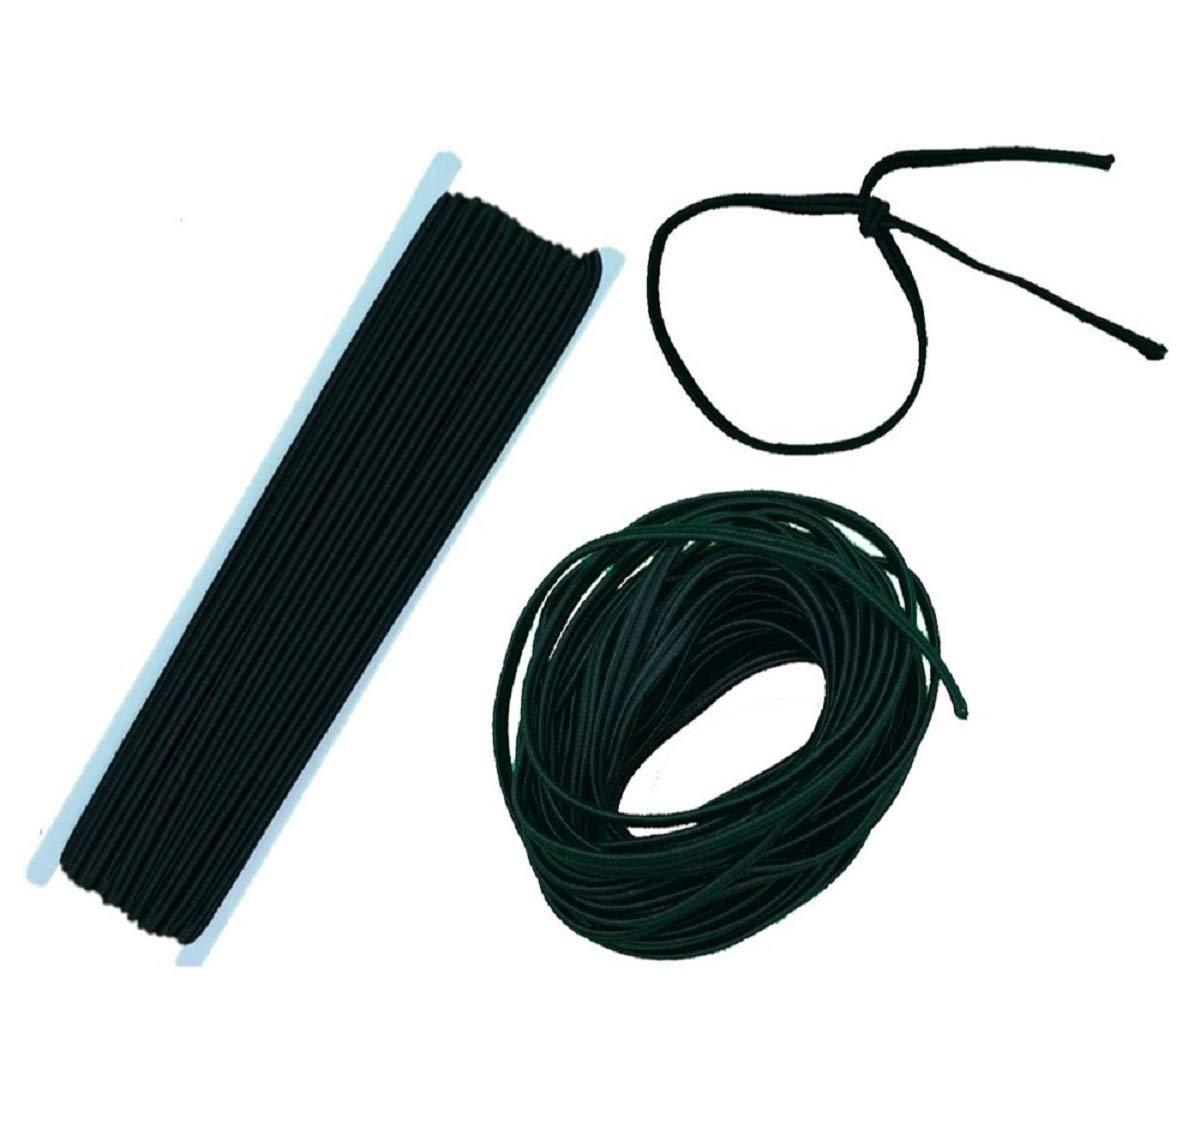 4mm Elastic Cord Useful For Diy Face Mask Elastic Black 20m